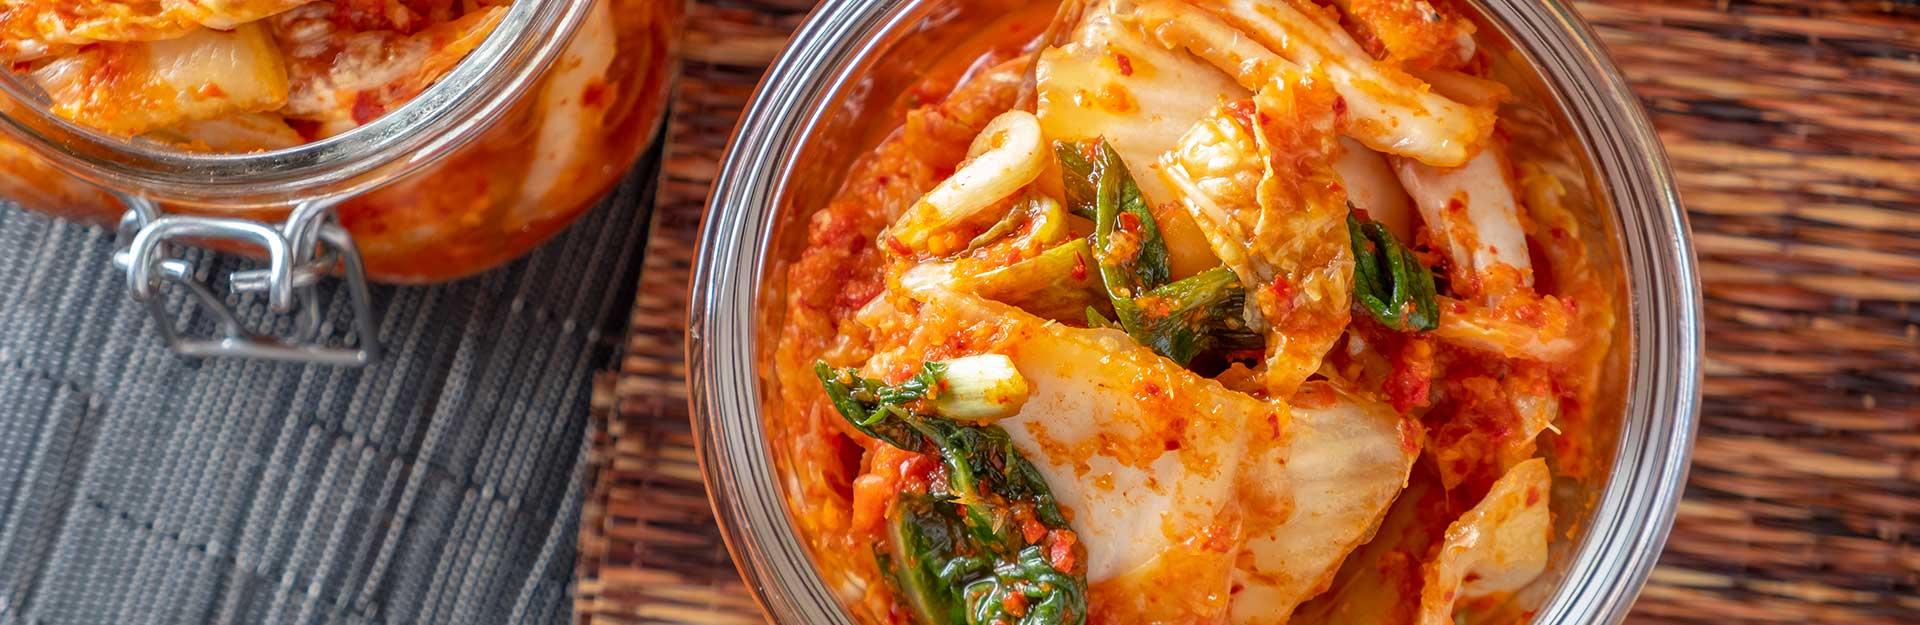 Jars of kimchi sitting on a table